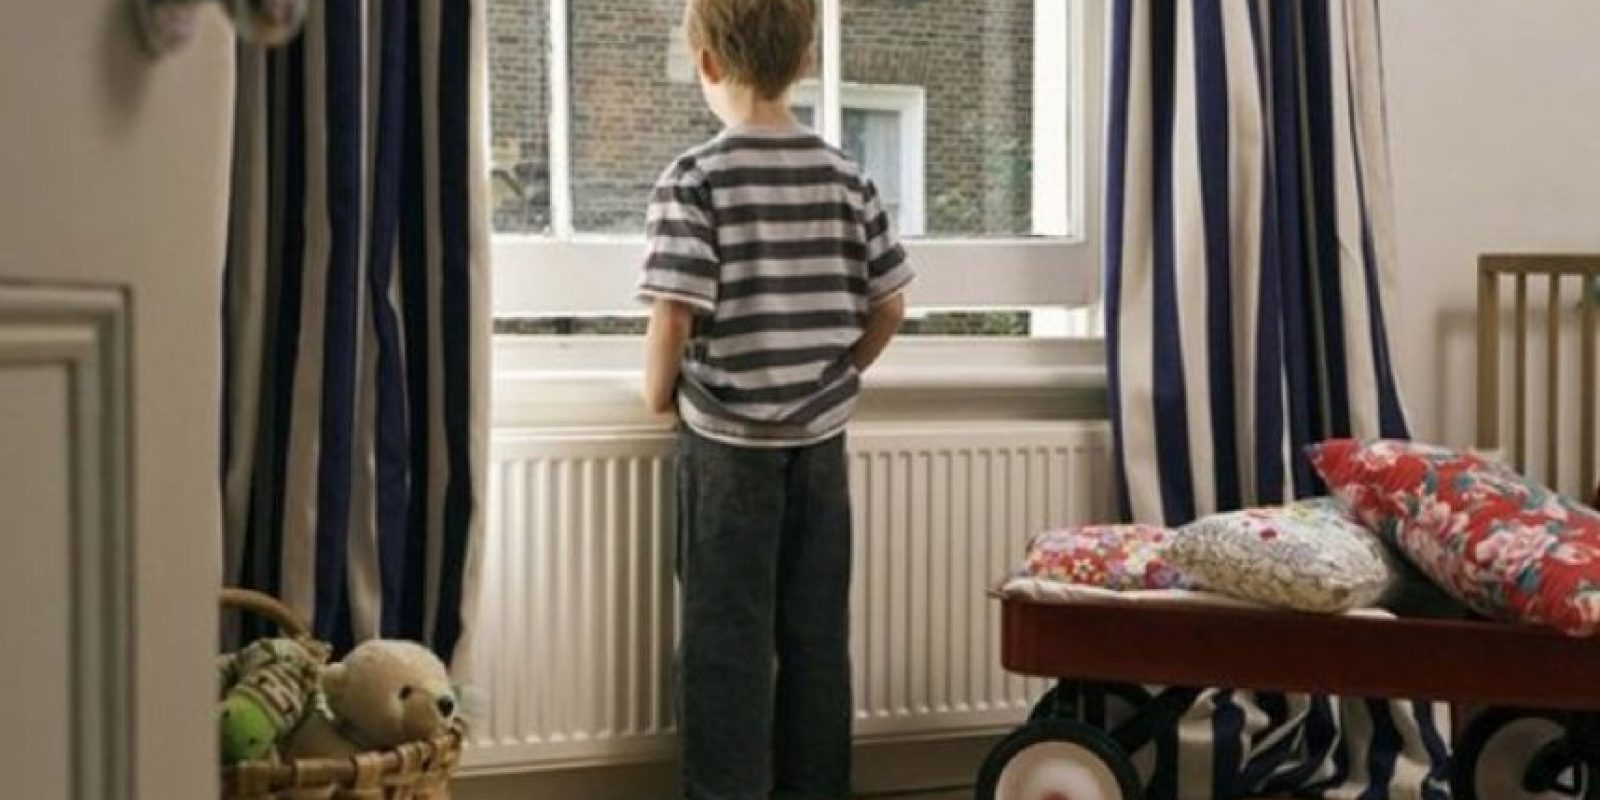 Sentir miedo o desesperación. Foto:Tumblr.com/Tagged-niños-solos-casa